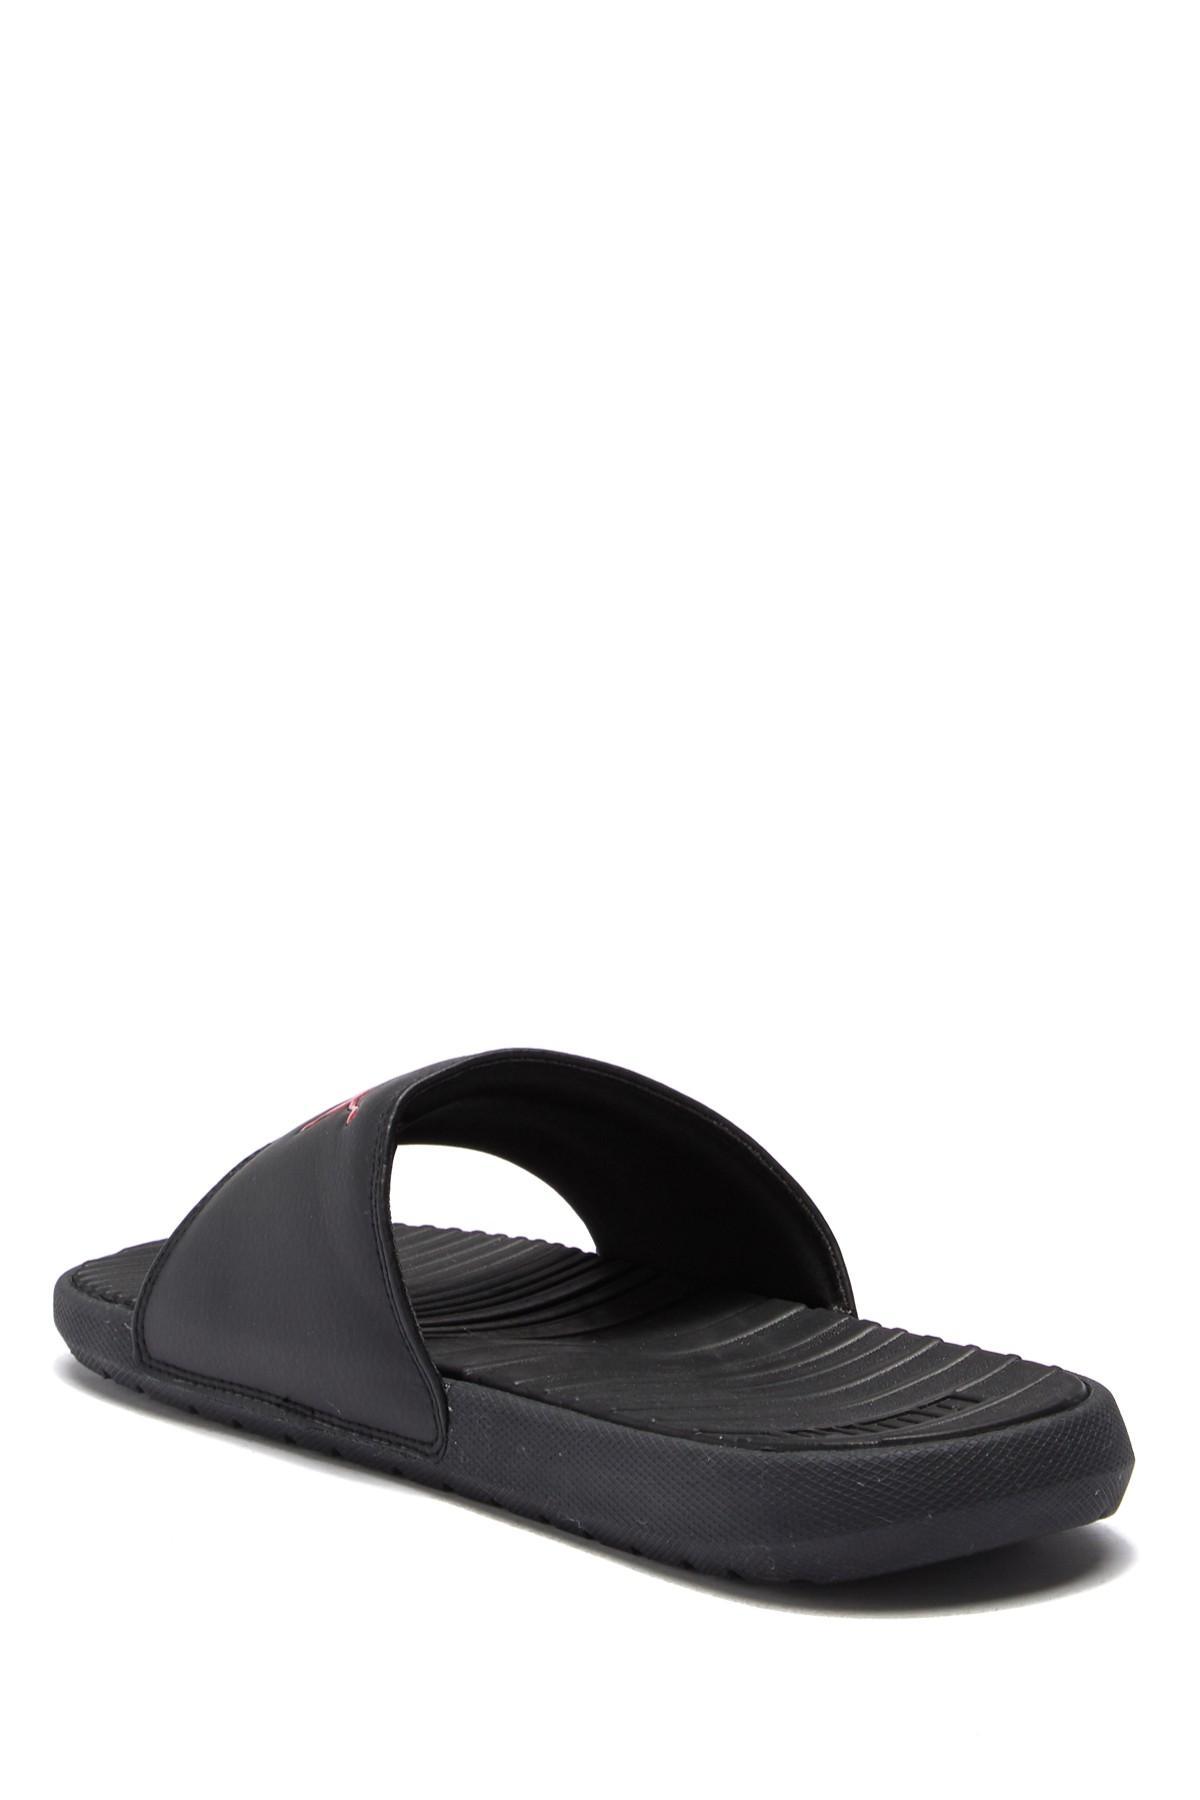 c5319b197 PUMA - Black Cool Cat Slide Sandal for Men - Lyst. View fullscreen